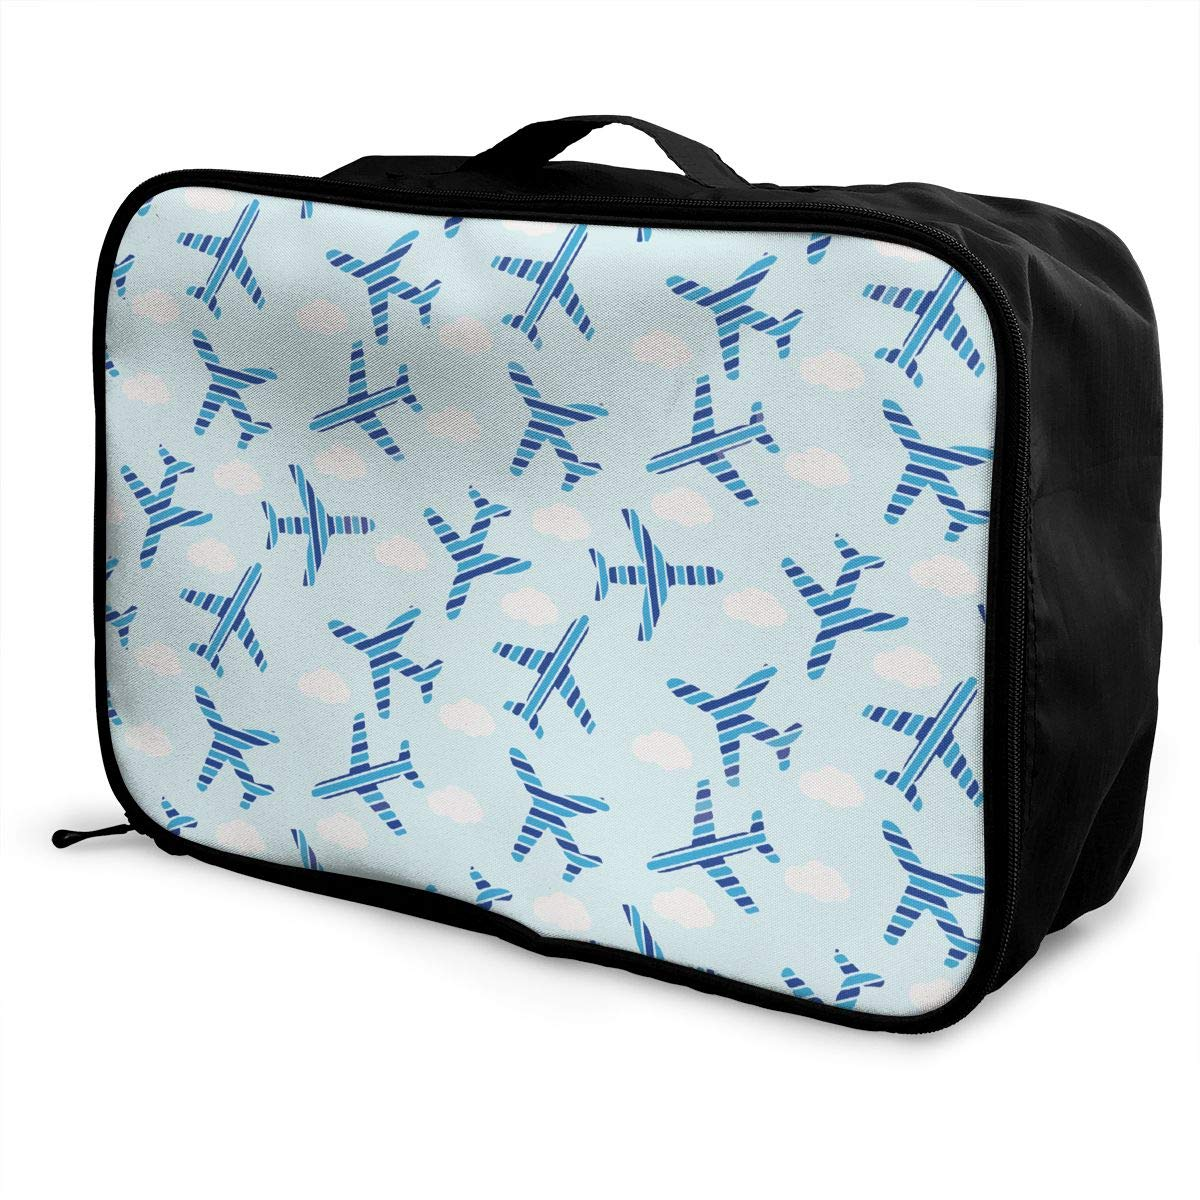 YueLJB Blue Stripe Plane Cloud Lightweight Large Capacity Portable Luggage Bag Travel Duffel Bag Storage Carry Luggage Duffle Tote Bag